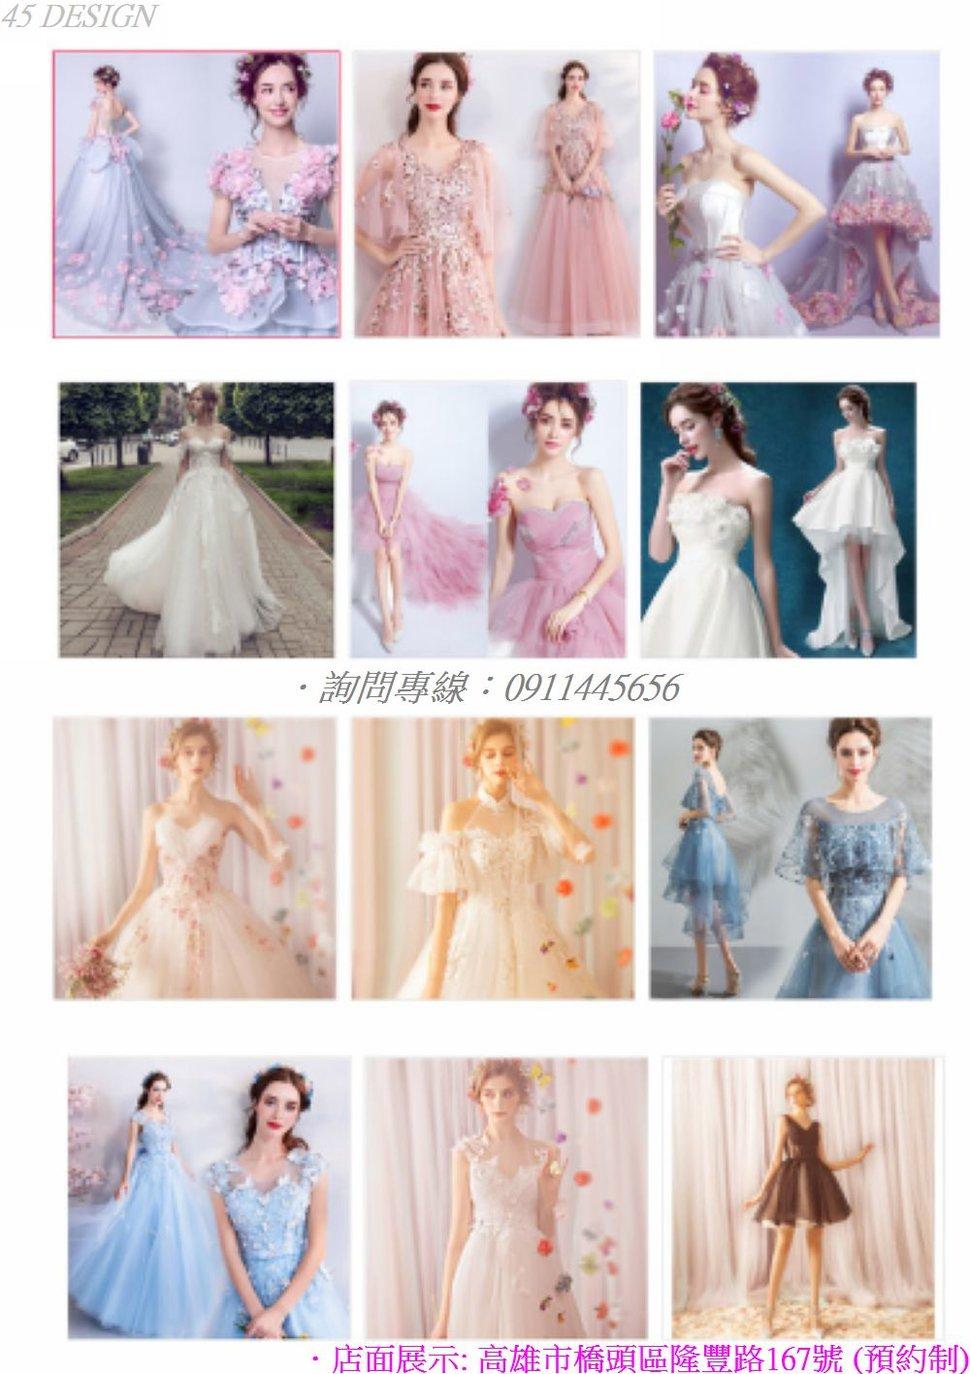 msl190815ADF816BC2F614A08931C98FEE848A91C - 全台最便宜-45DESIGN四五婚紗禮服《結婚吧》